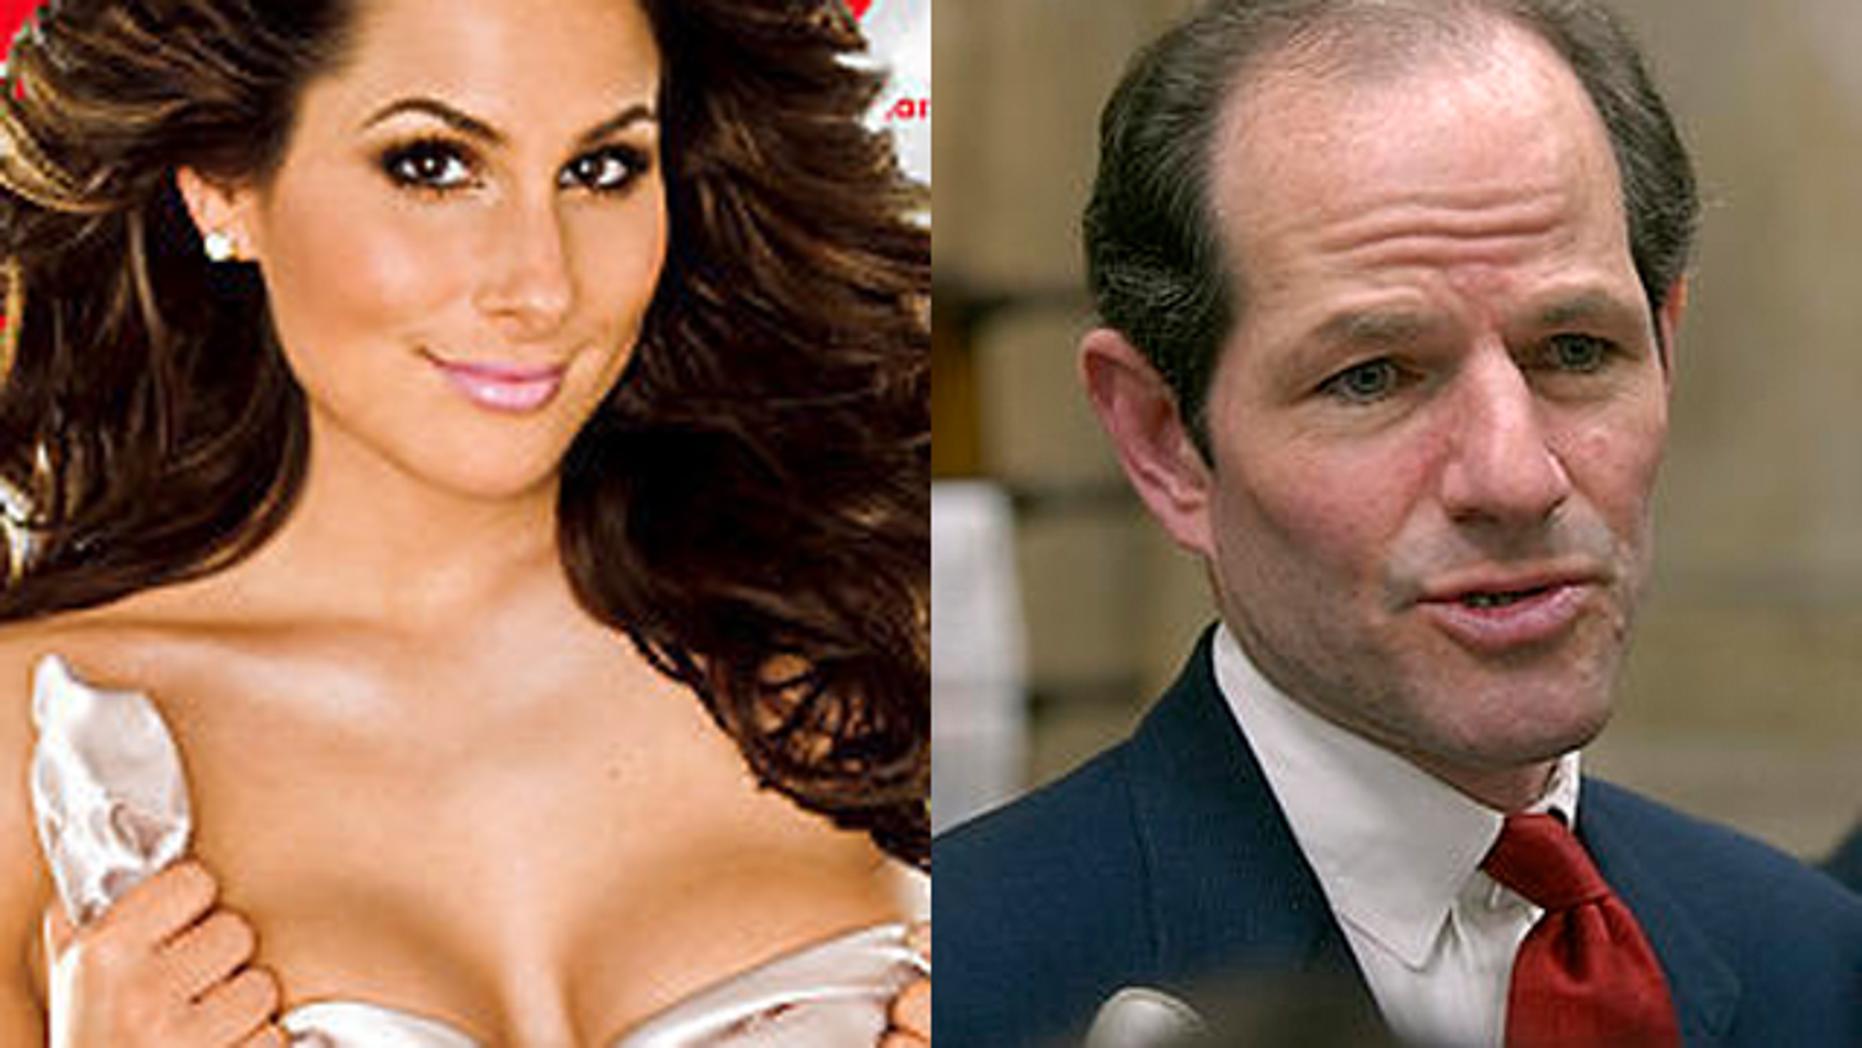 Ashley Dupre and Eliot Spitzer. (Playboy/AP)